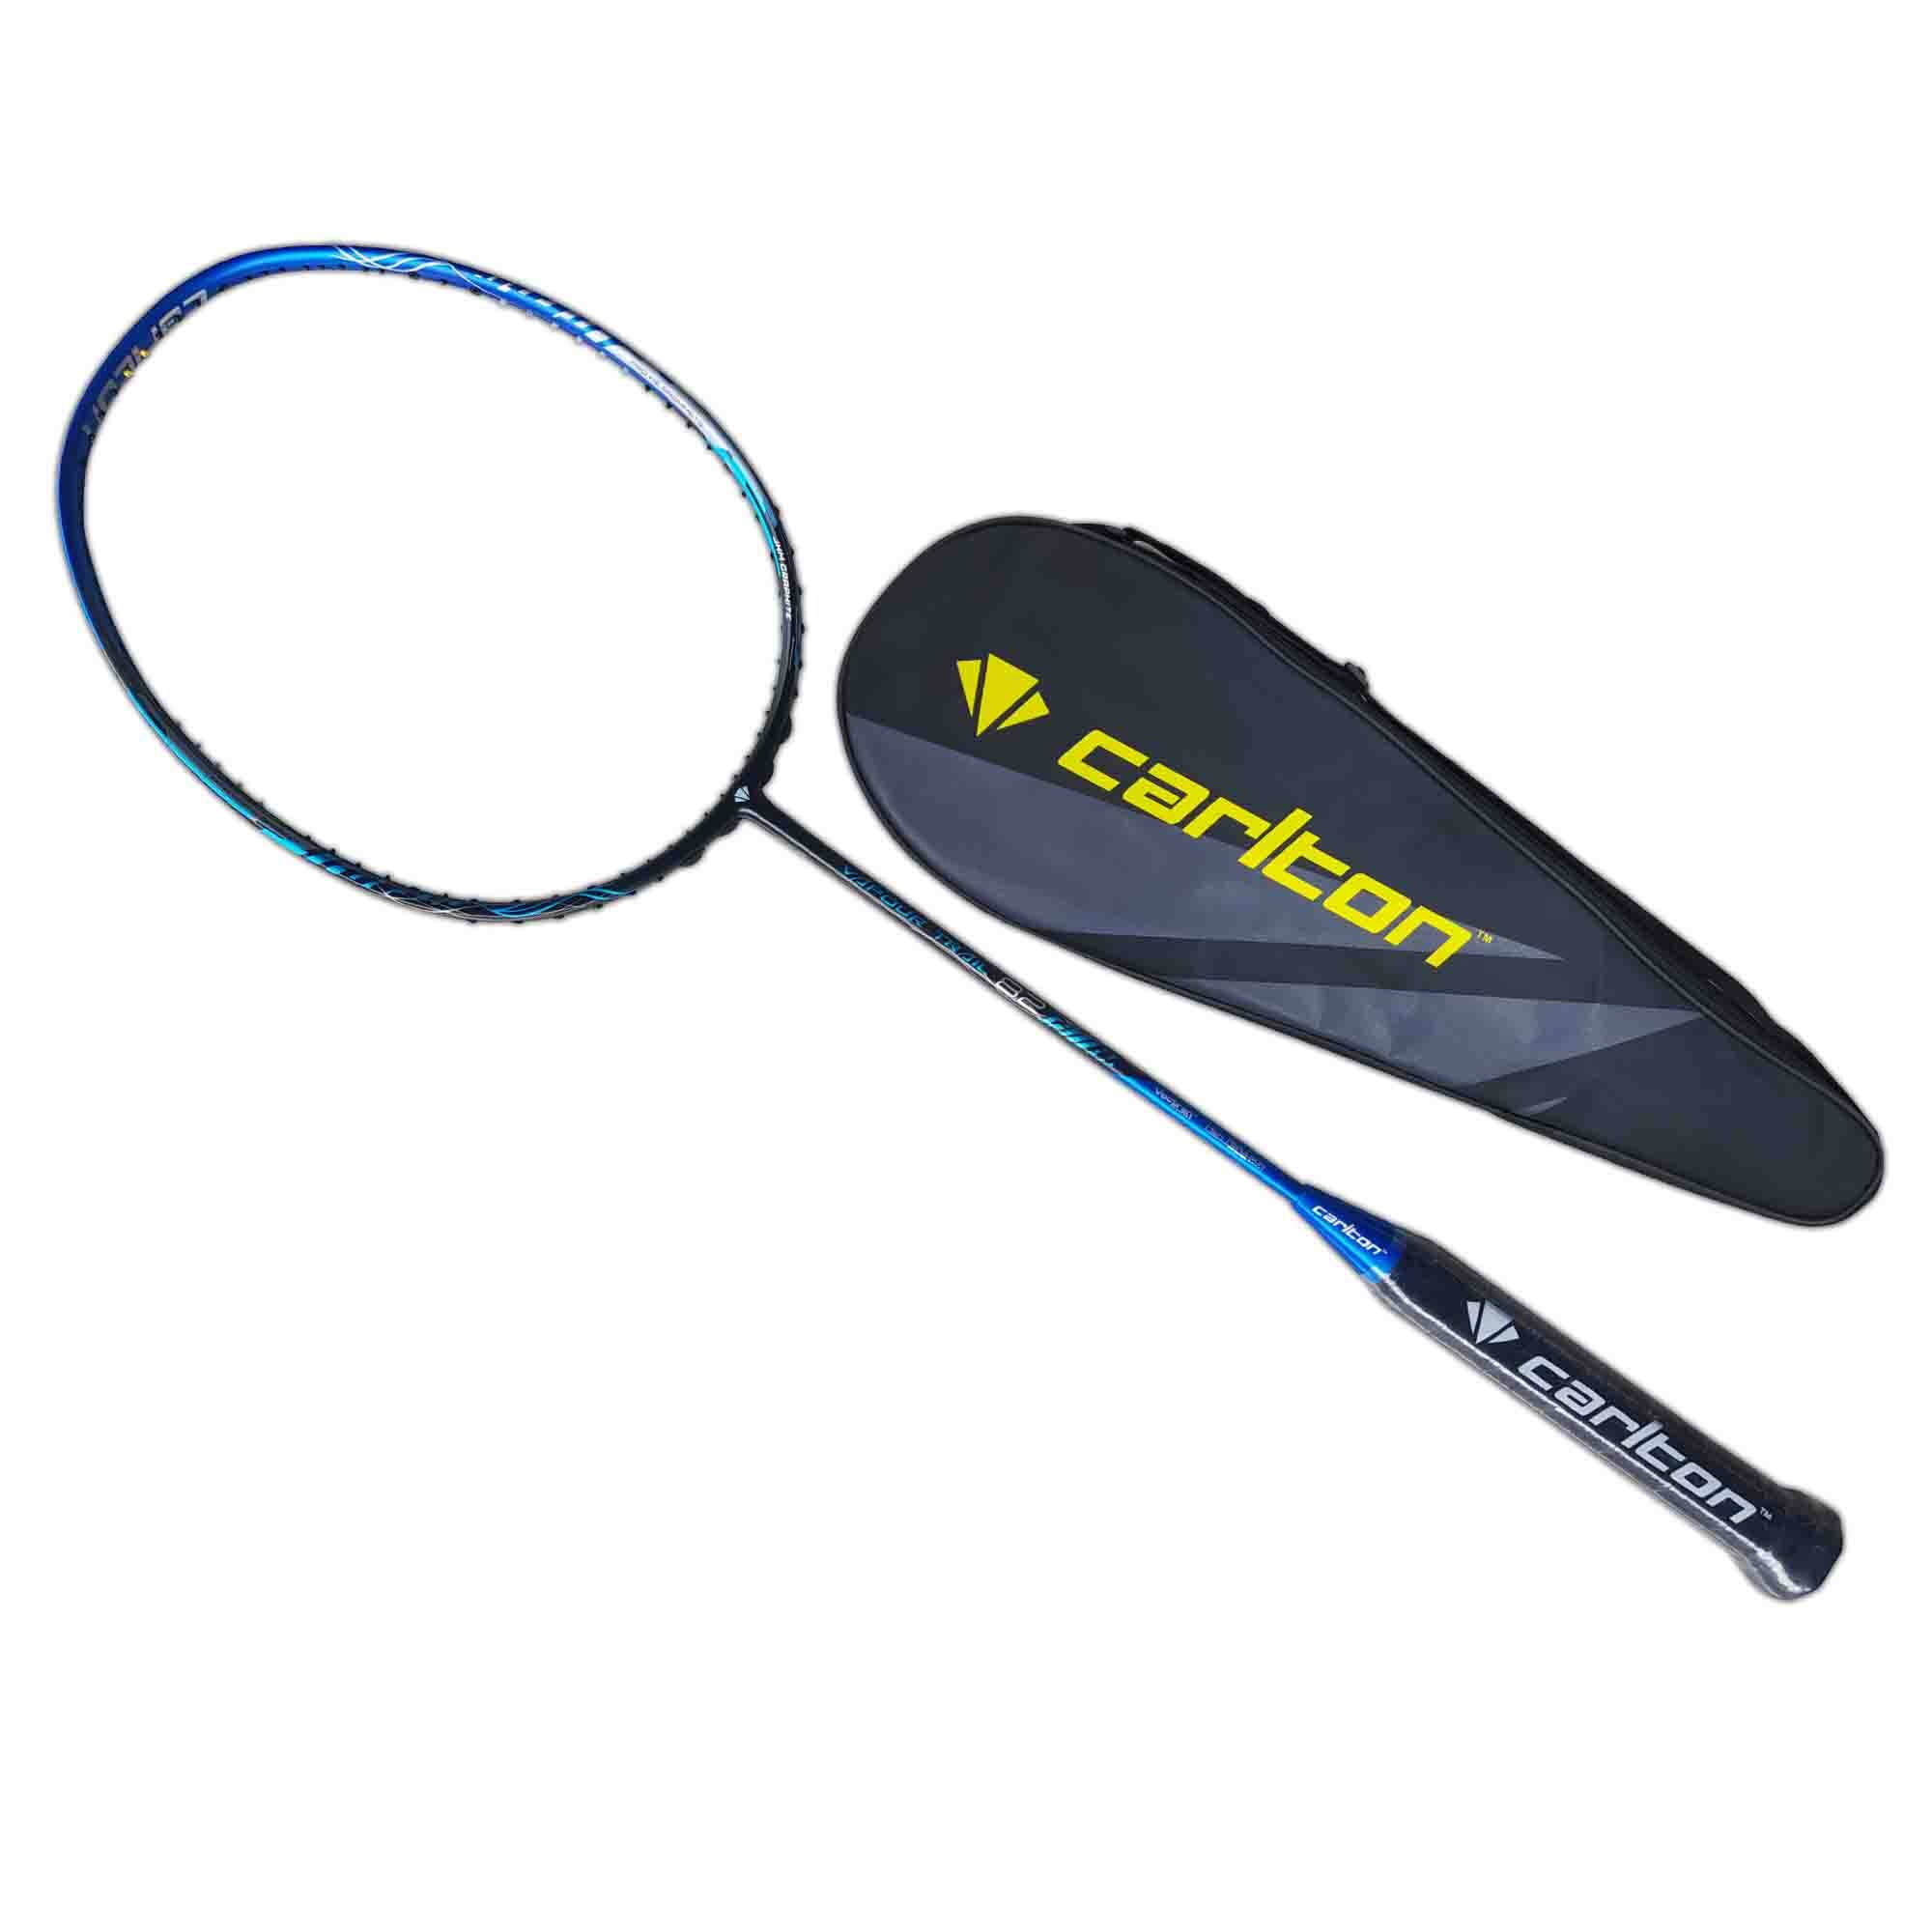 Carlton Badminton Racket Vapour Trail 82 4U